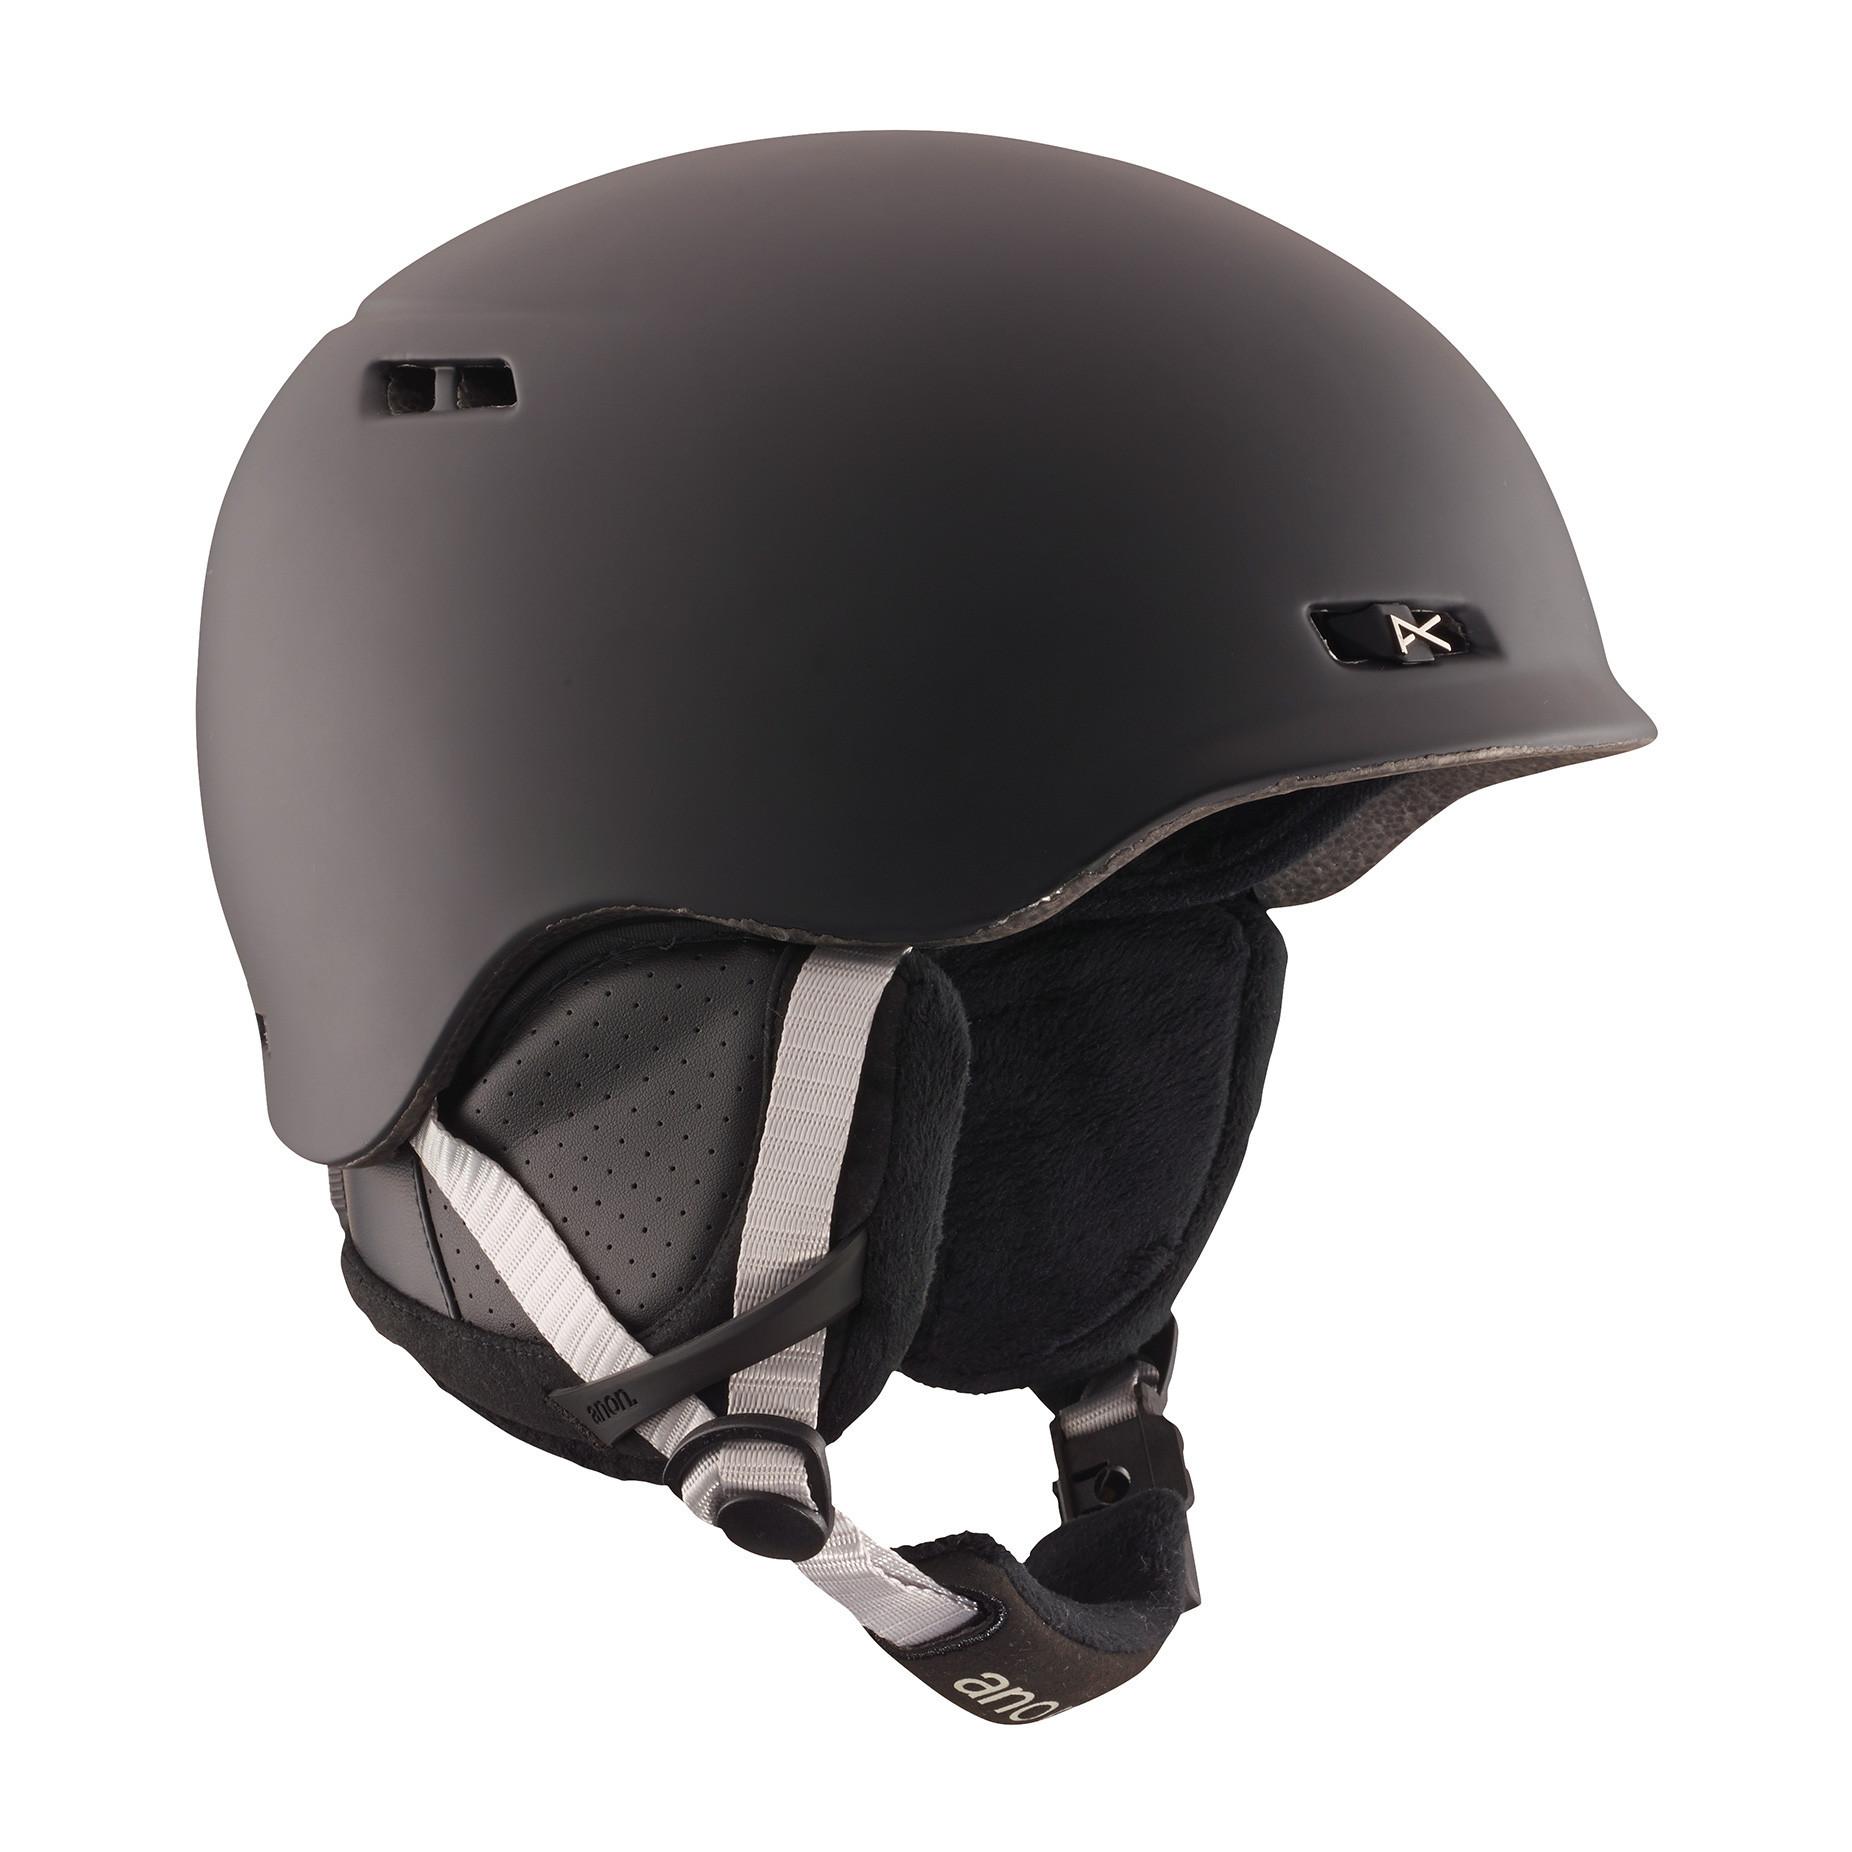 anon. Griffon Women s Snowboard Helmet - Black 060f07a61e